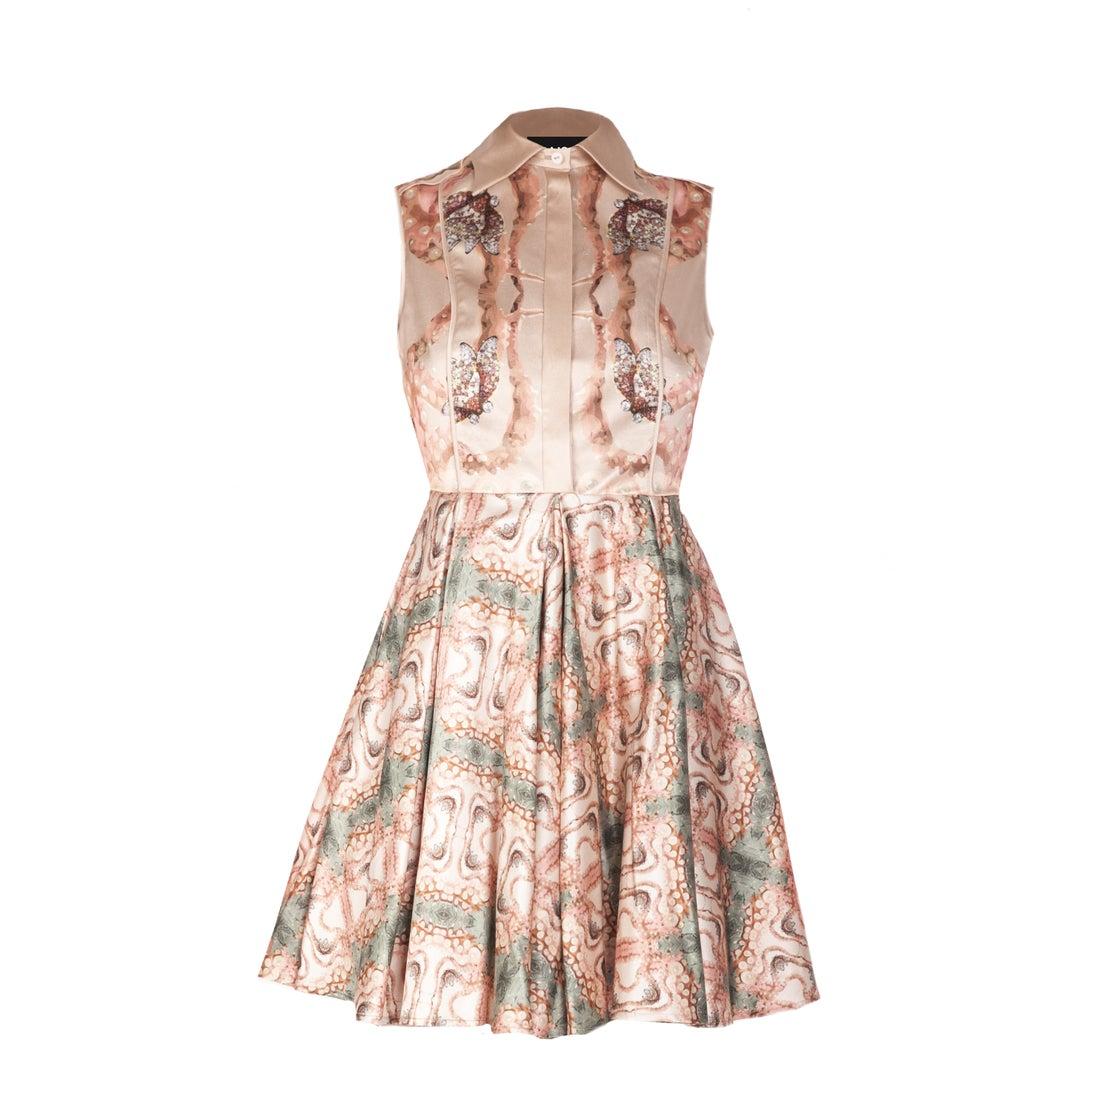 Image of MIAMI DRESS| Anemone